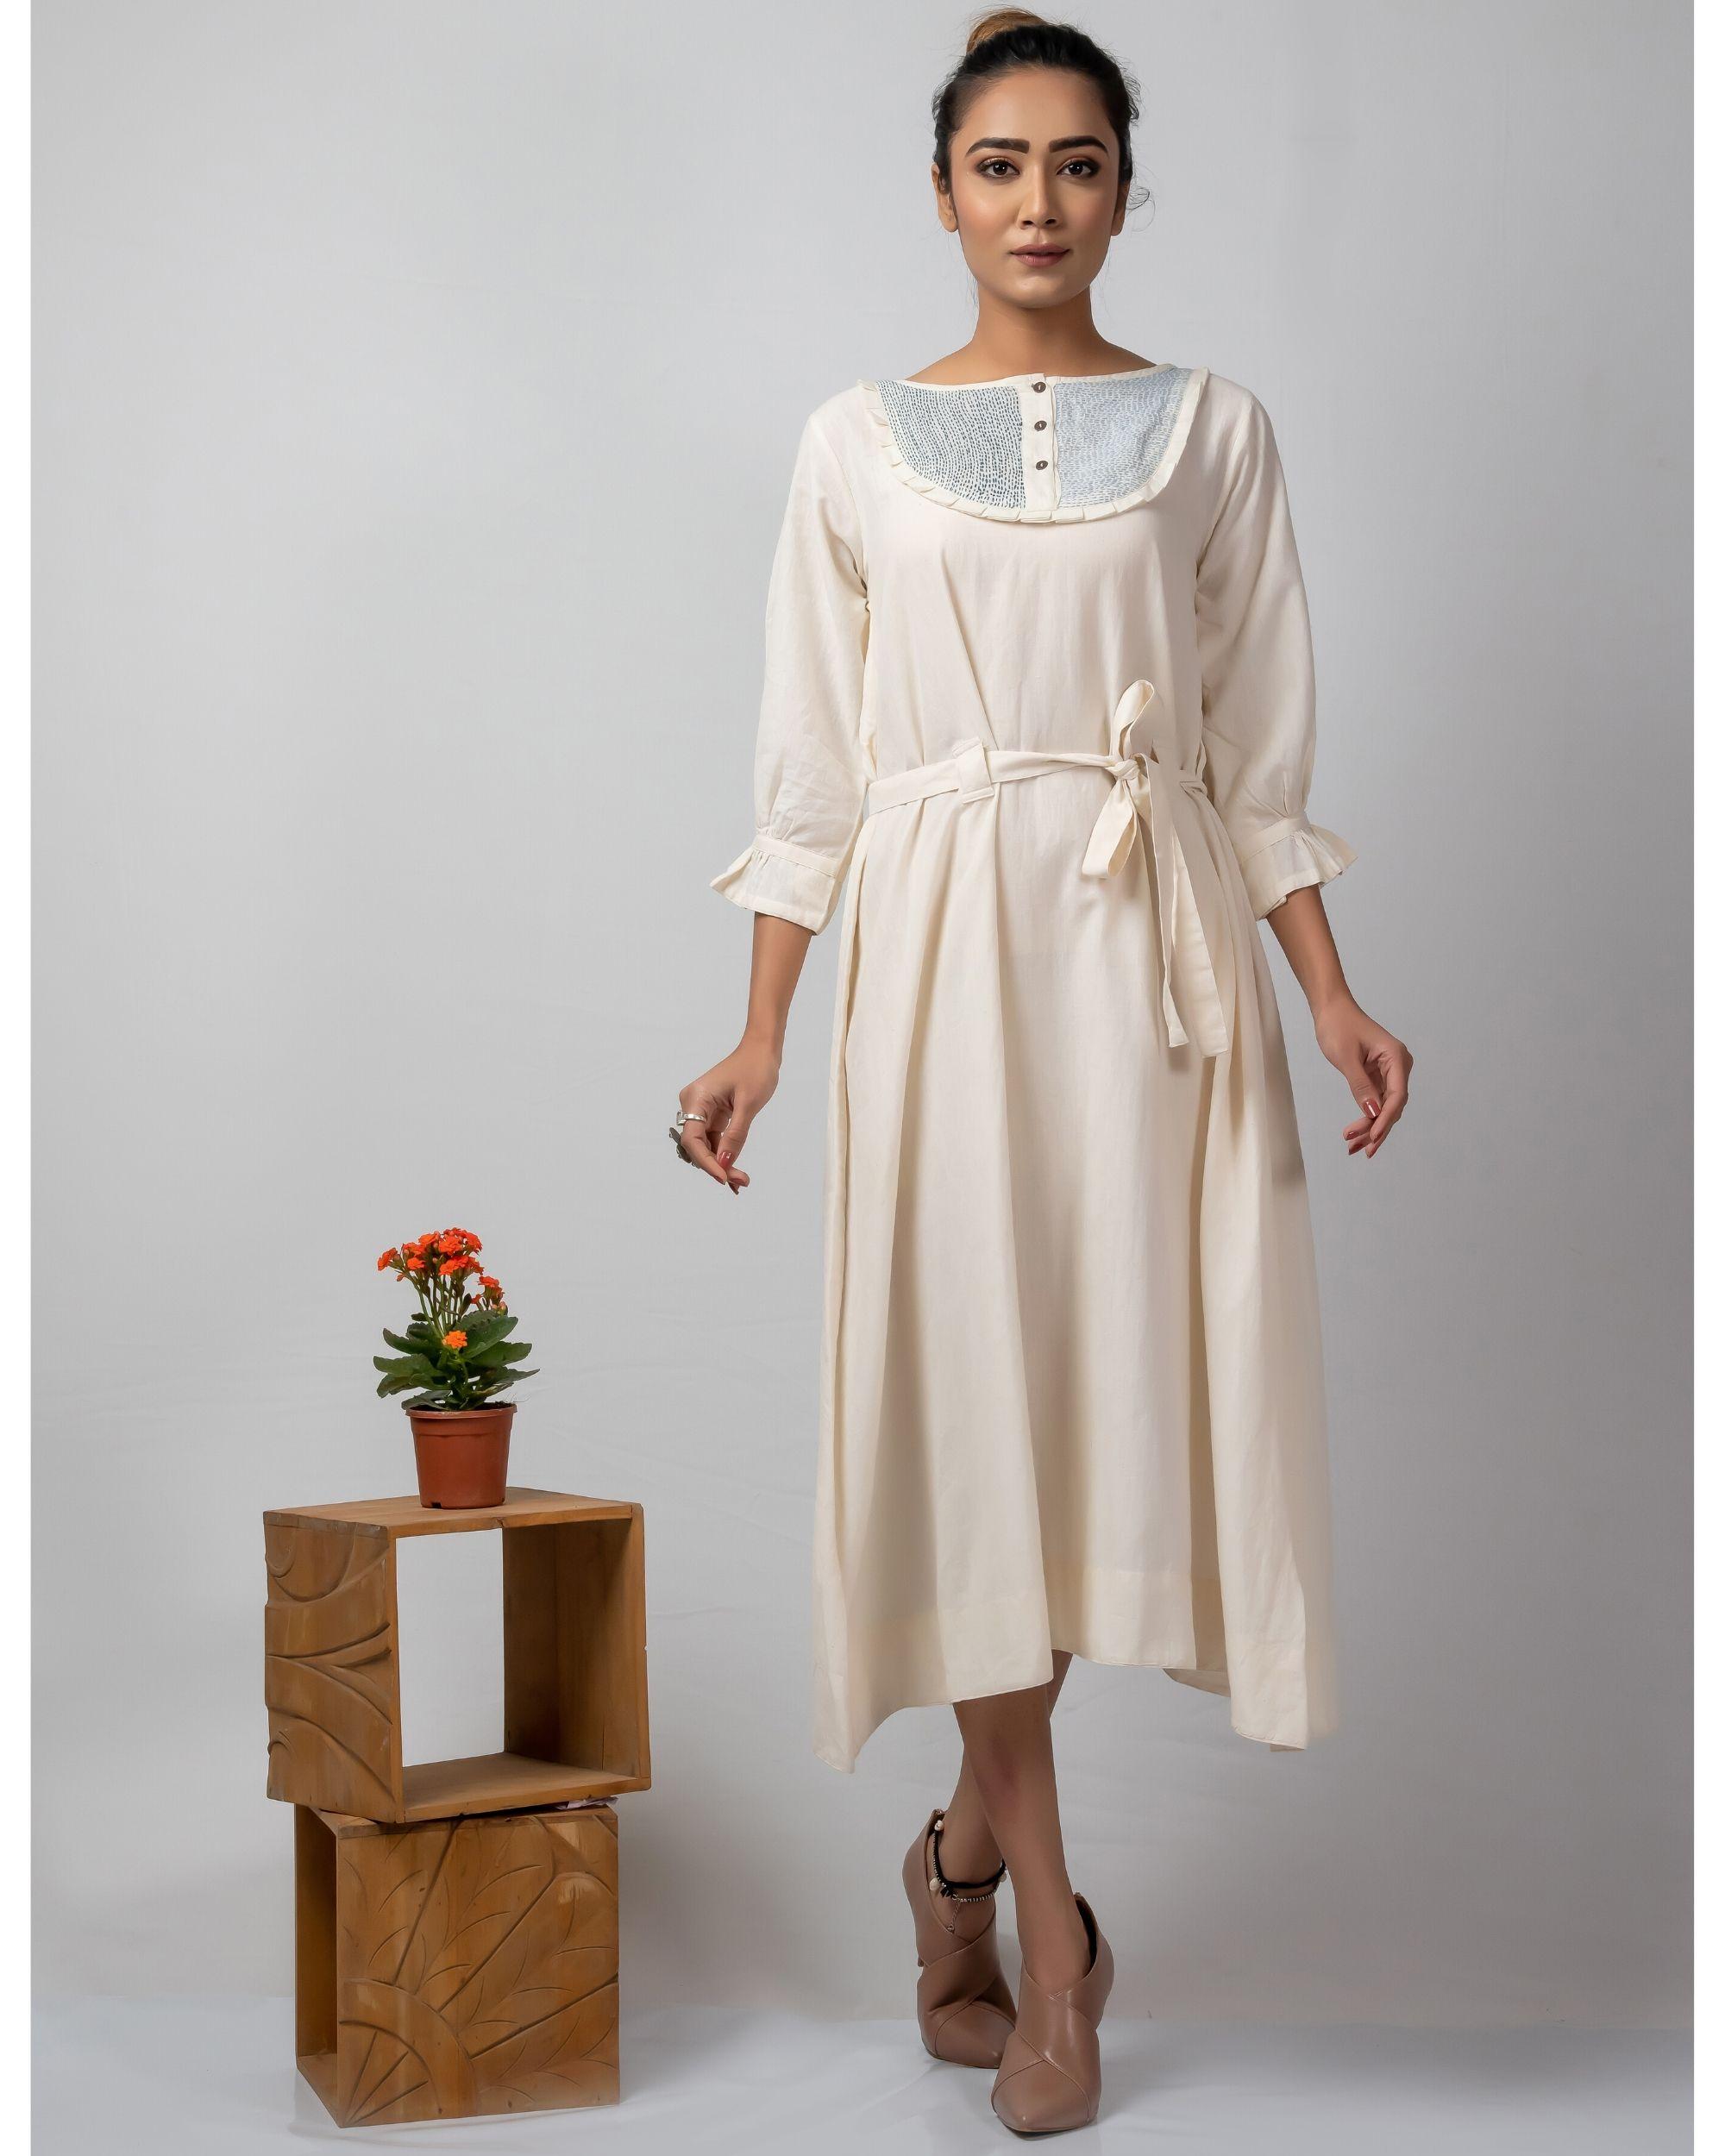 Off white kantha embroidered yoke dress